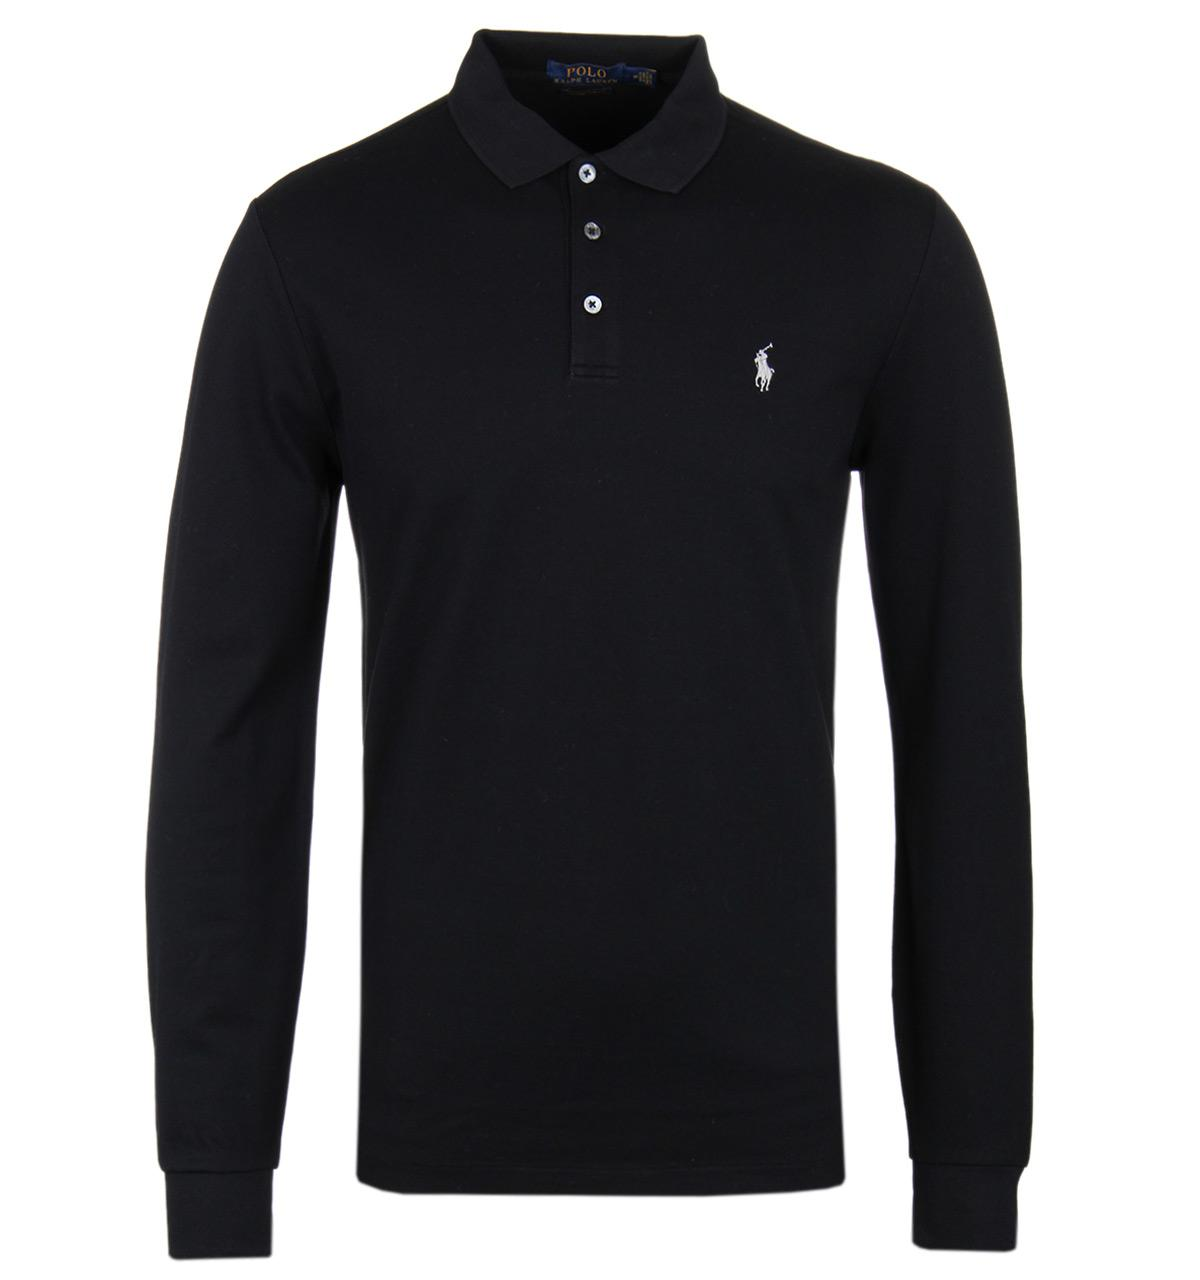 Polo ralph lauren black long sleeve stretch pique polo for Mens long sleeve pique polo shirts